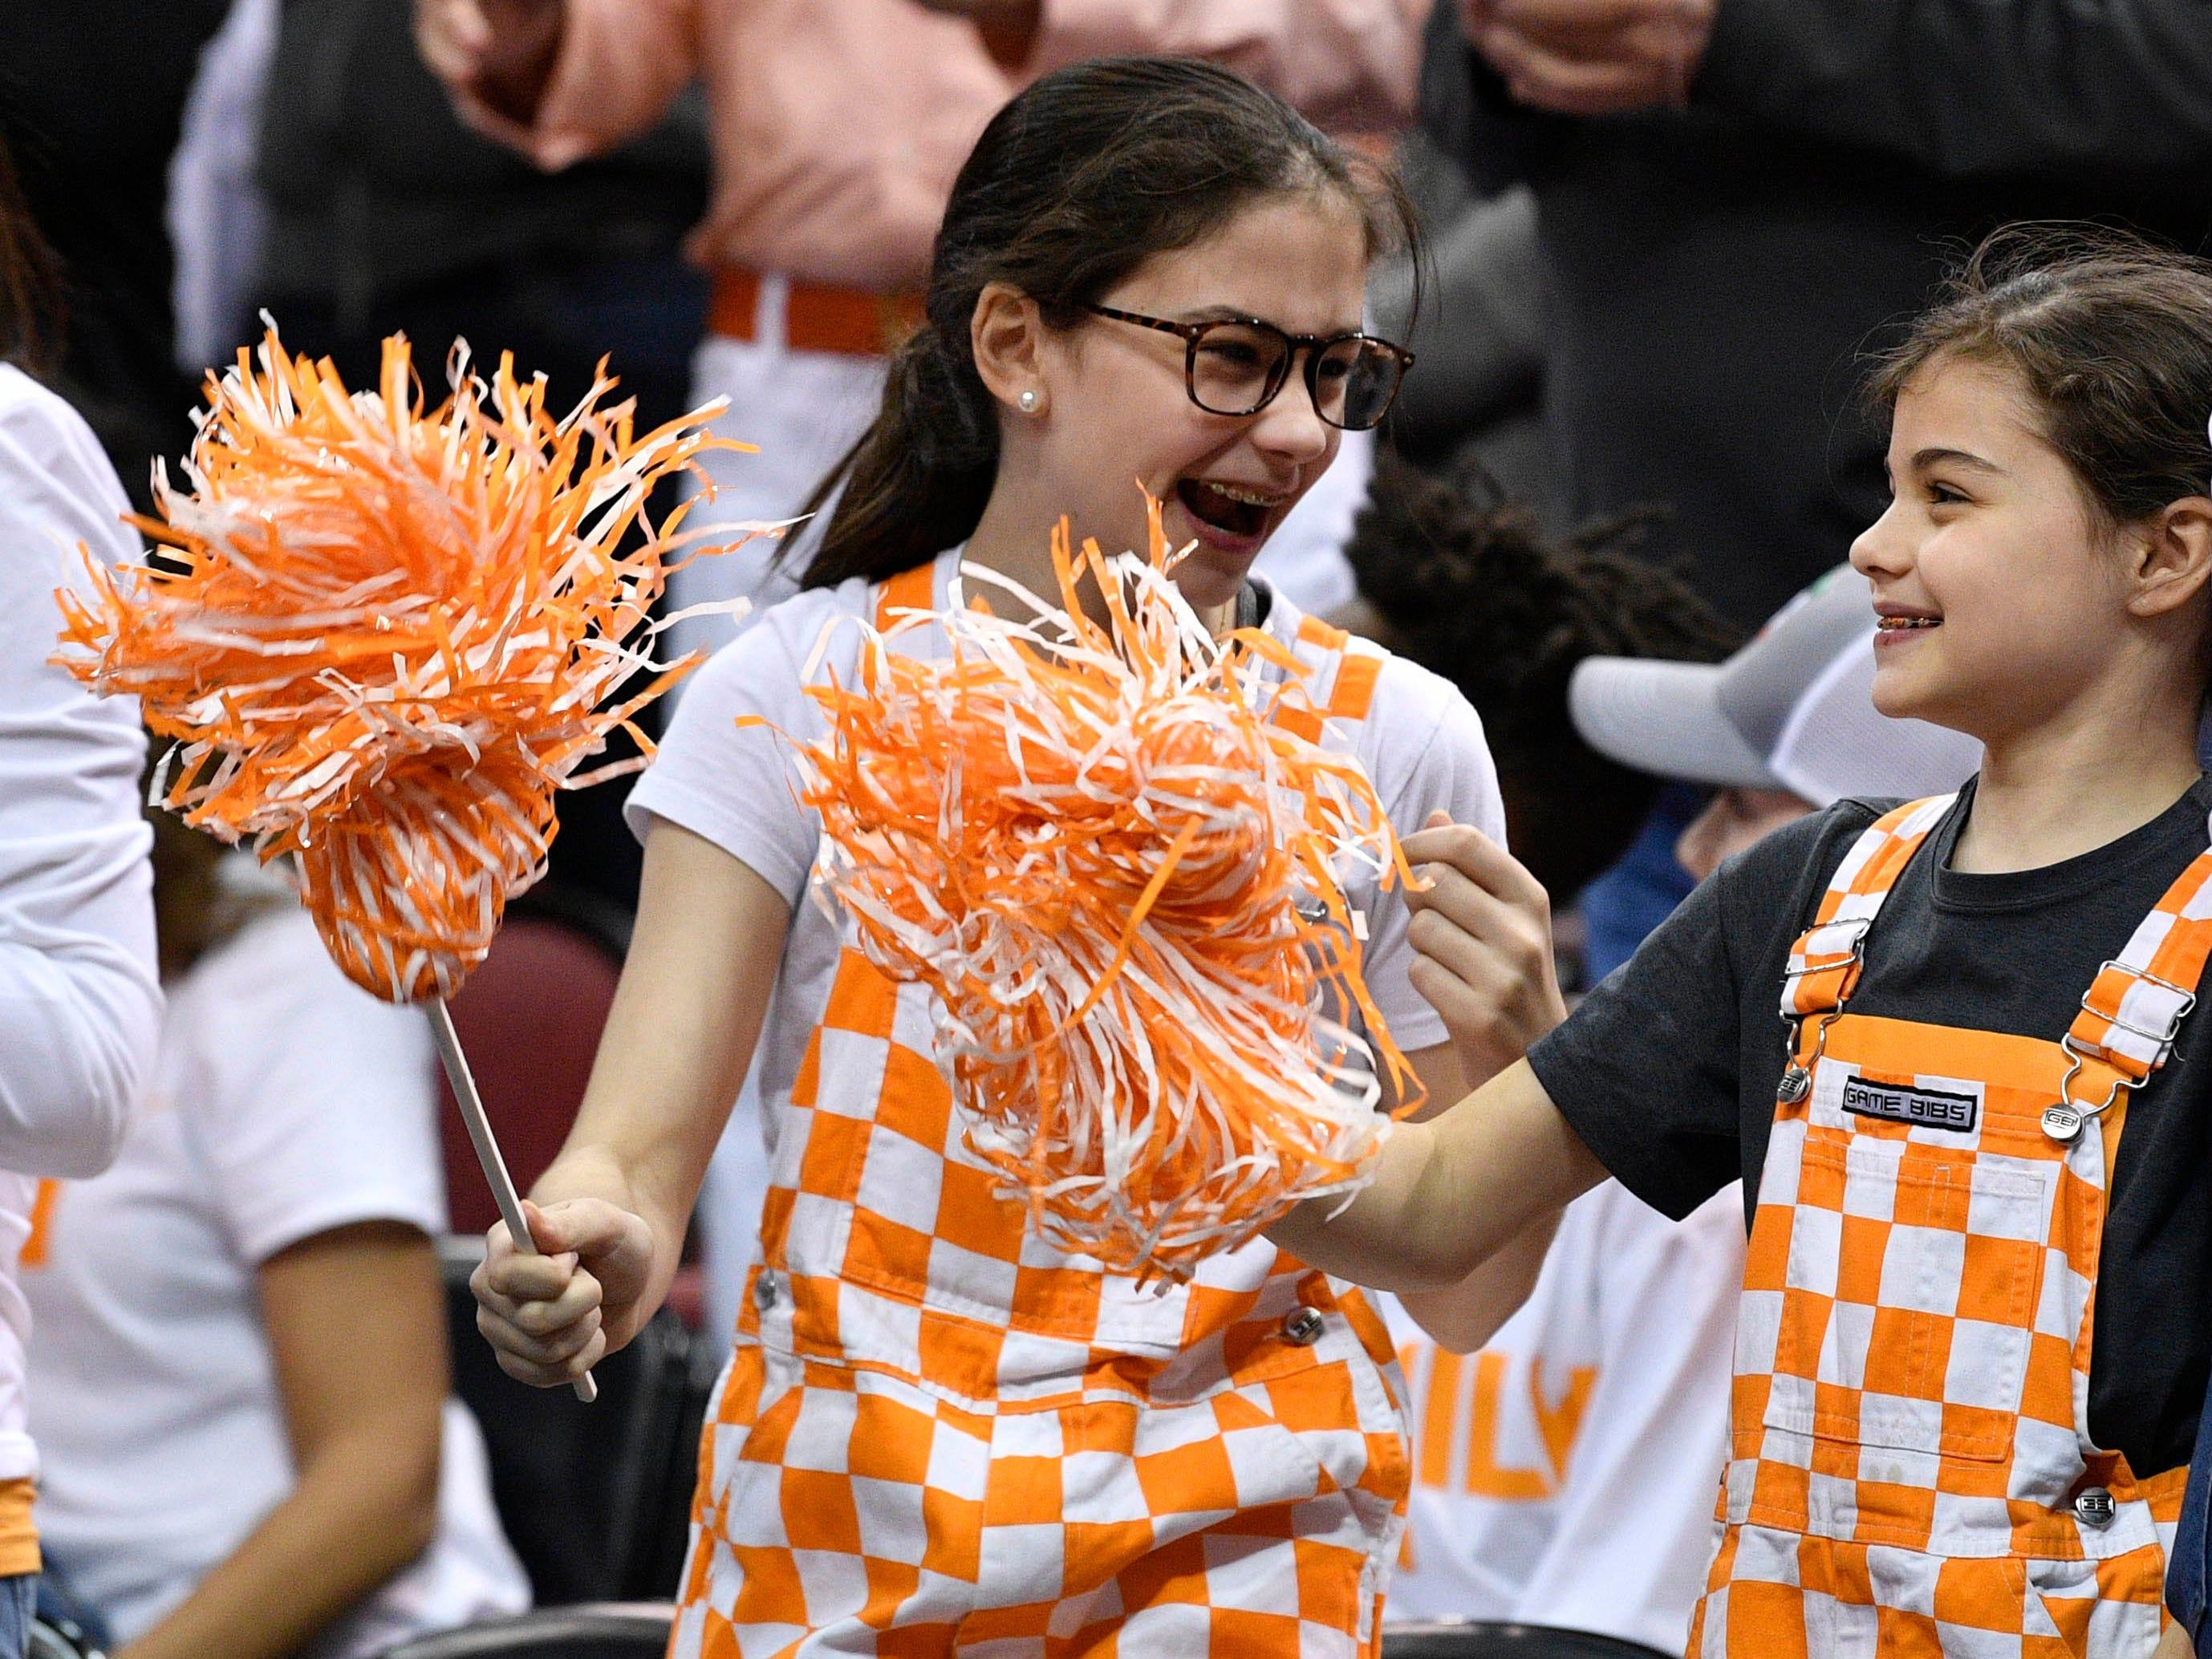 Sweet 16: Tennessee Volunteers fans cheer before the game against the Purdue Boilermakers.